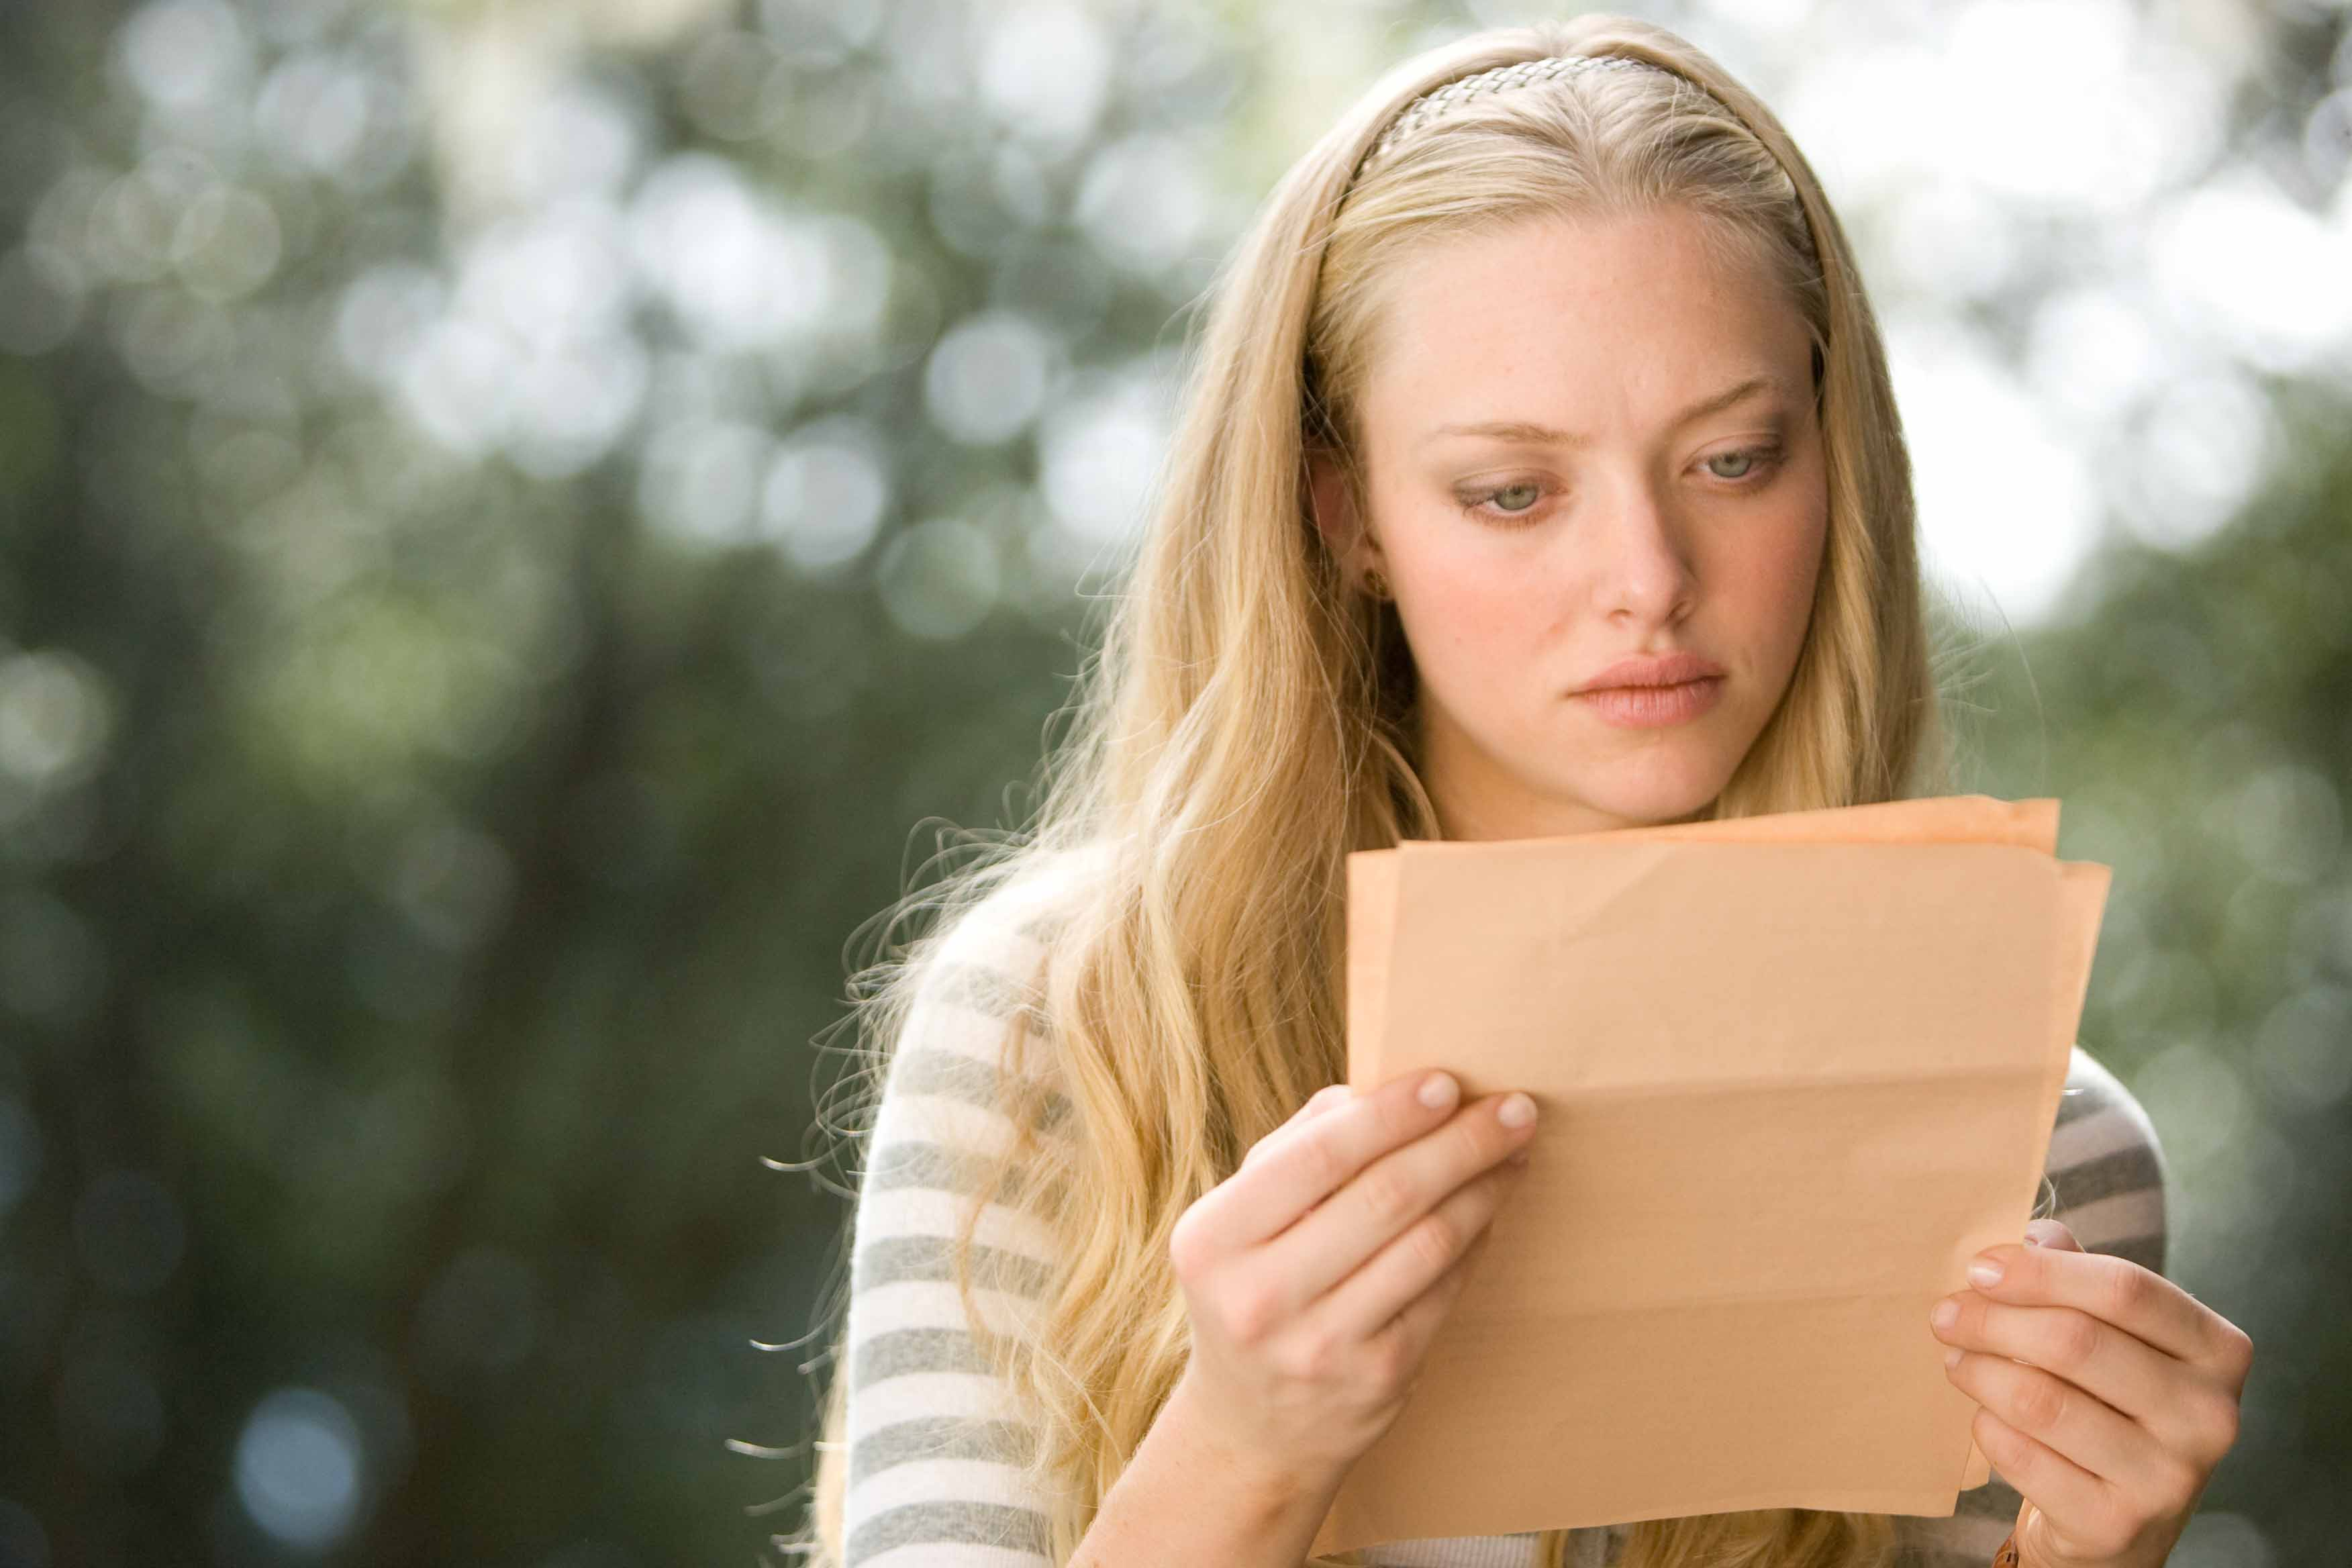 4 Hal yang Bikin Kamu Menyesal Kalau Minta Balikan Sama Mantan